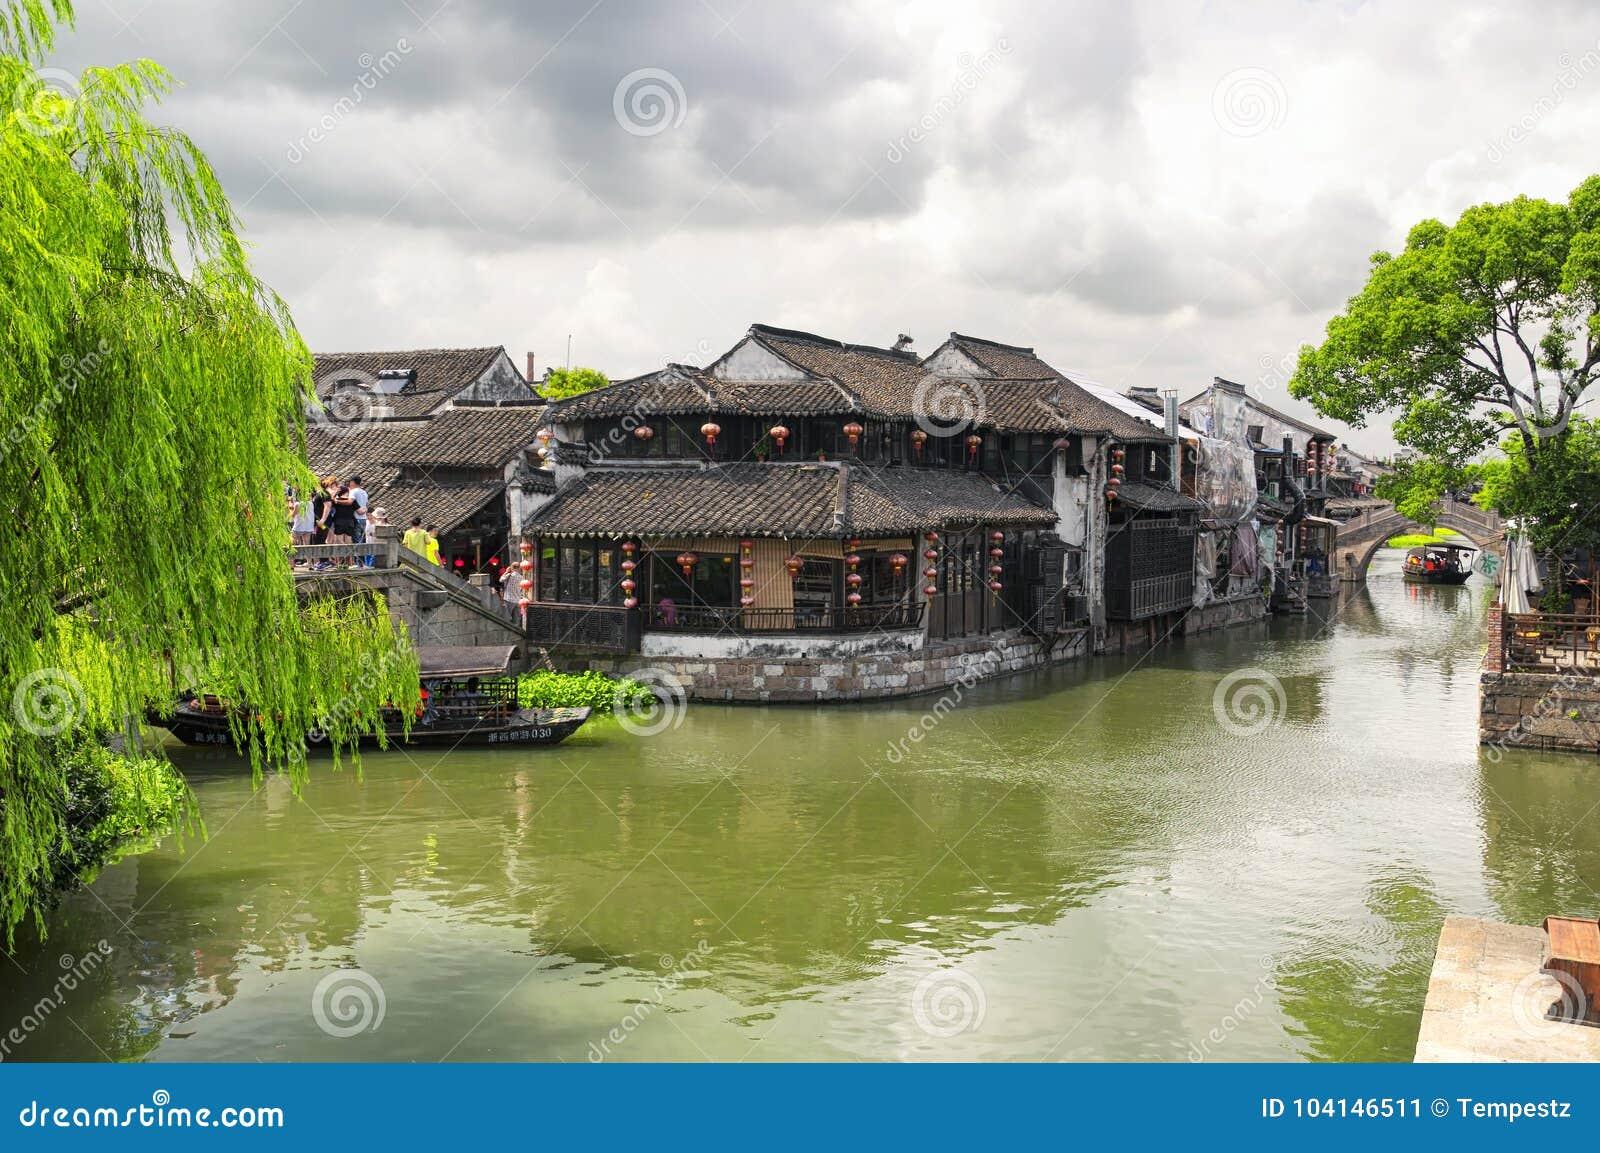 Xitang Water Town China scenic view